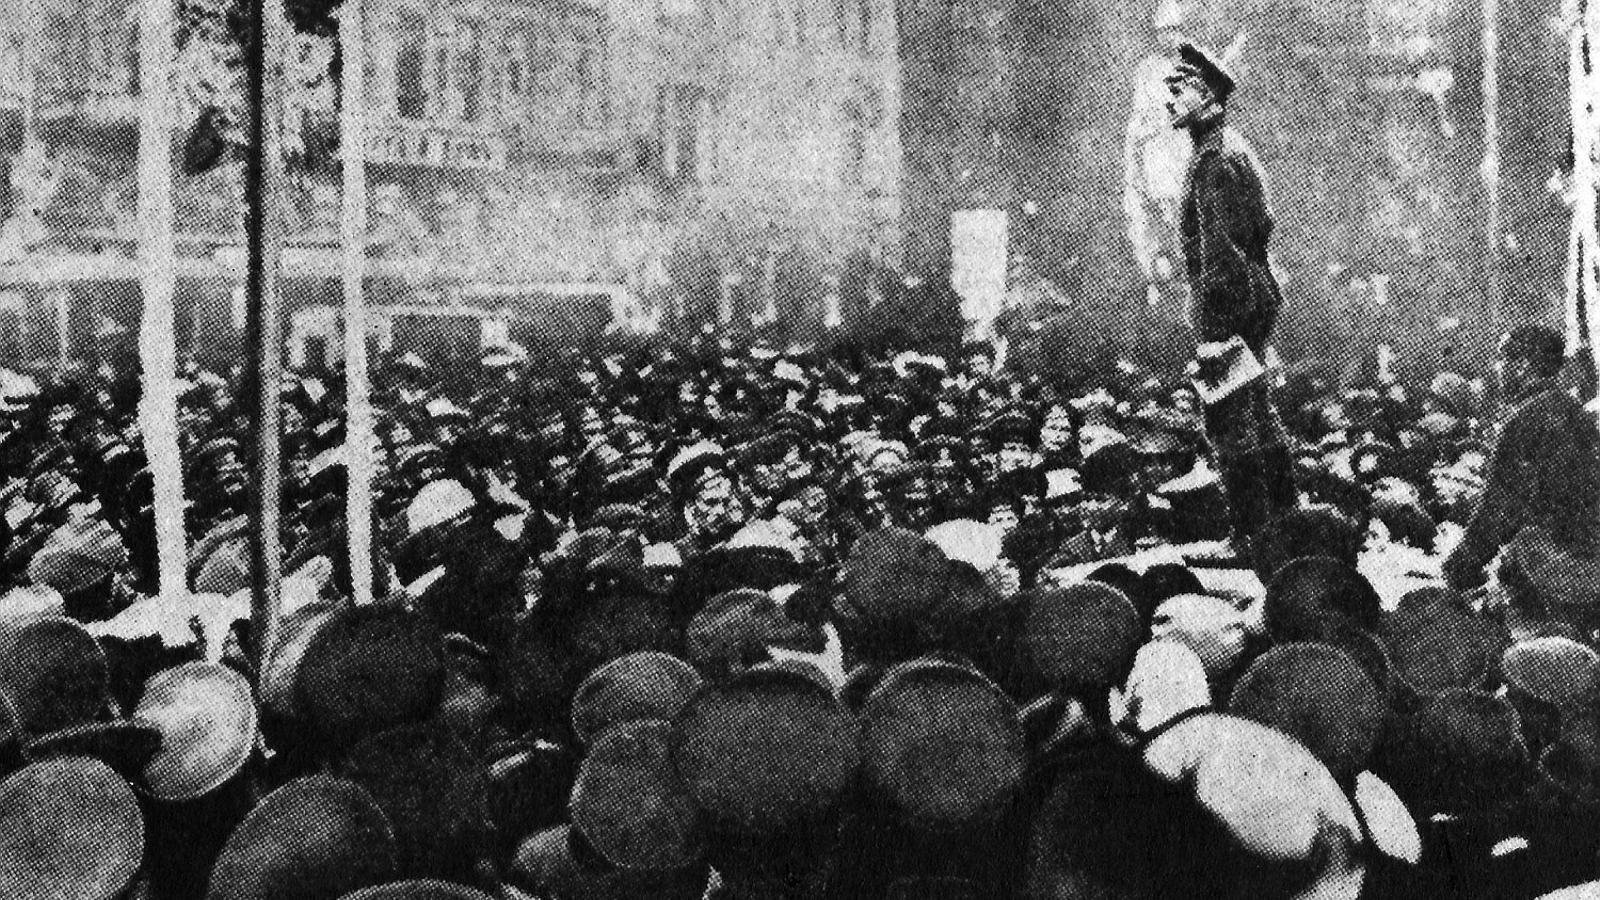 La població manifestant-se a Petrograd / GETTY IMAGES